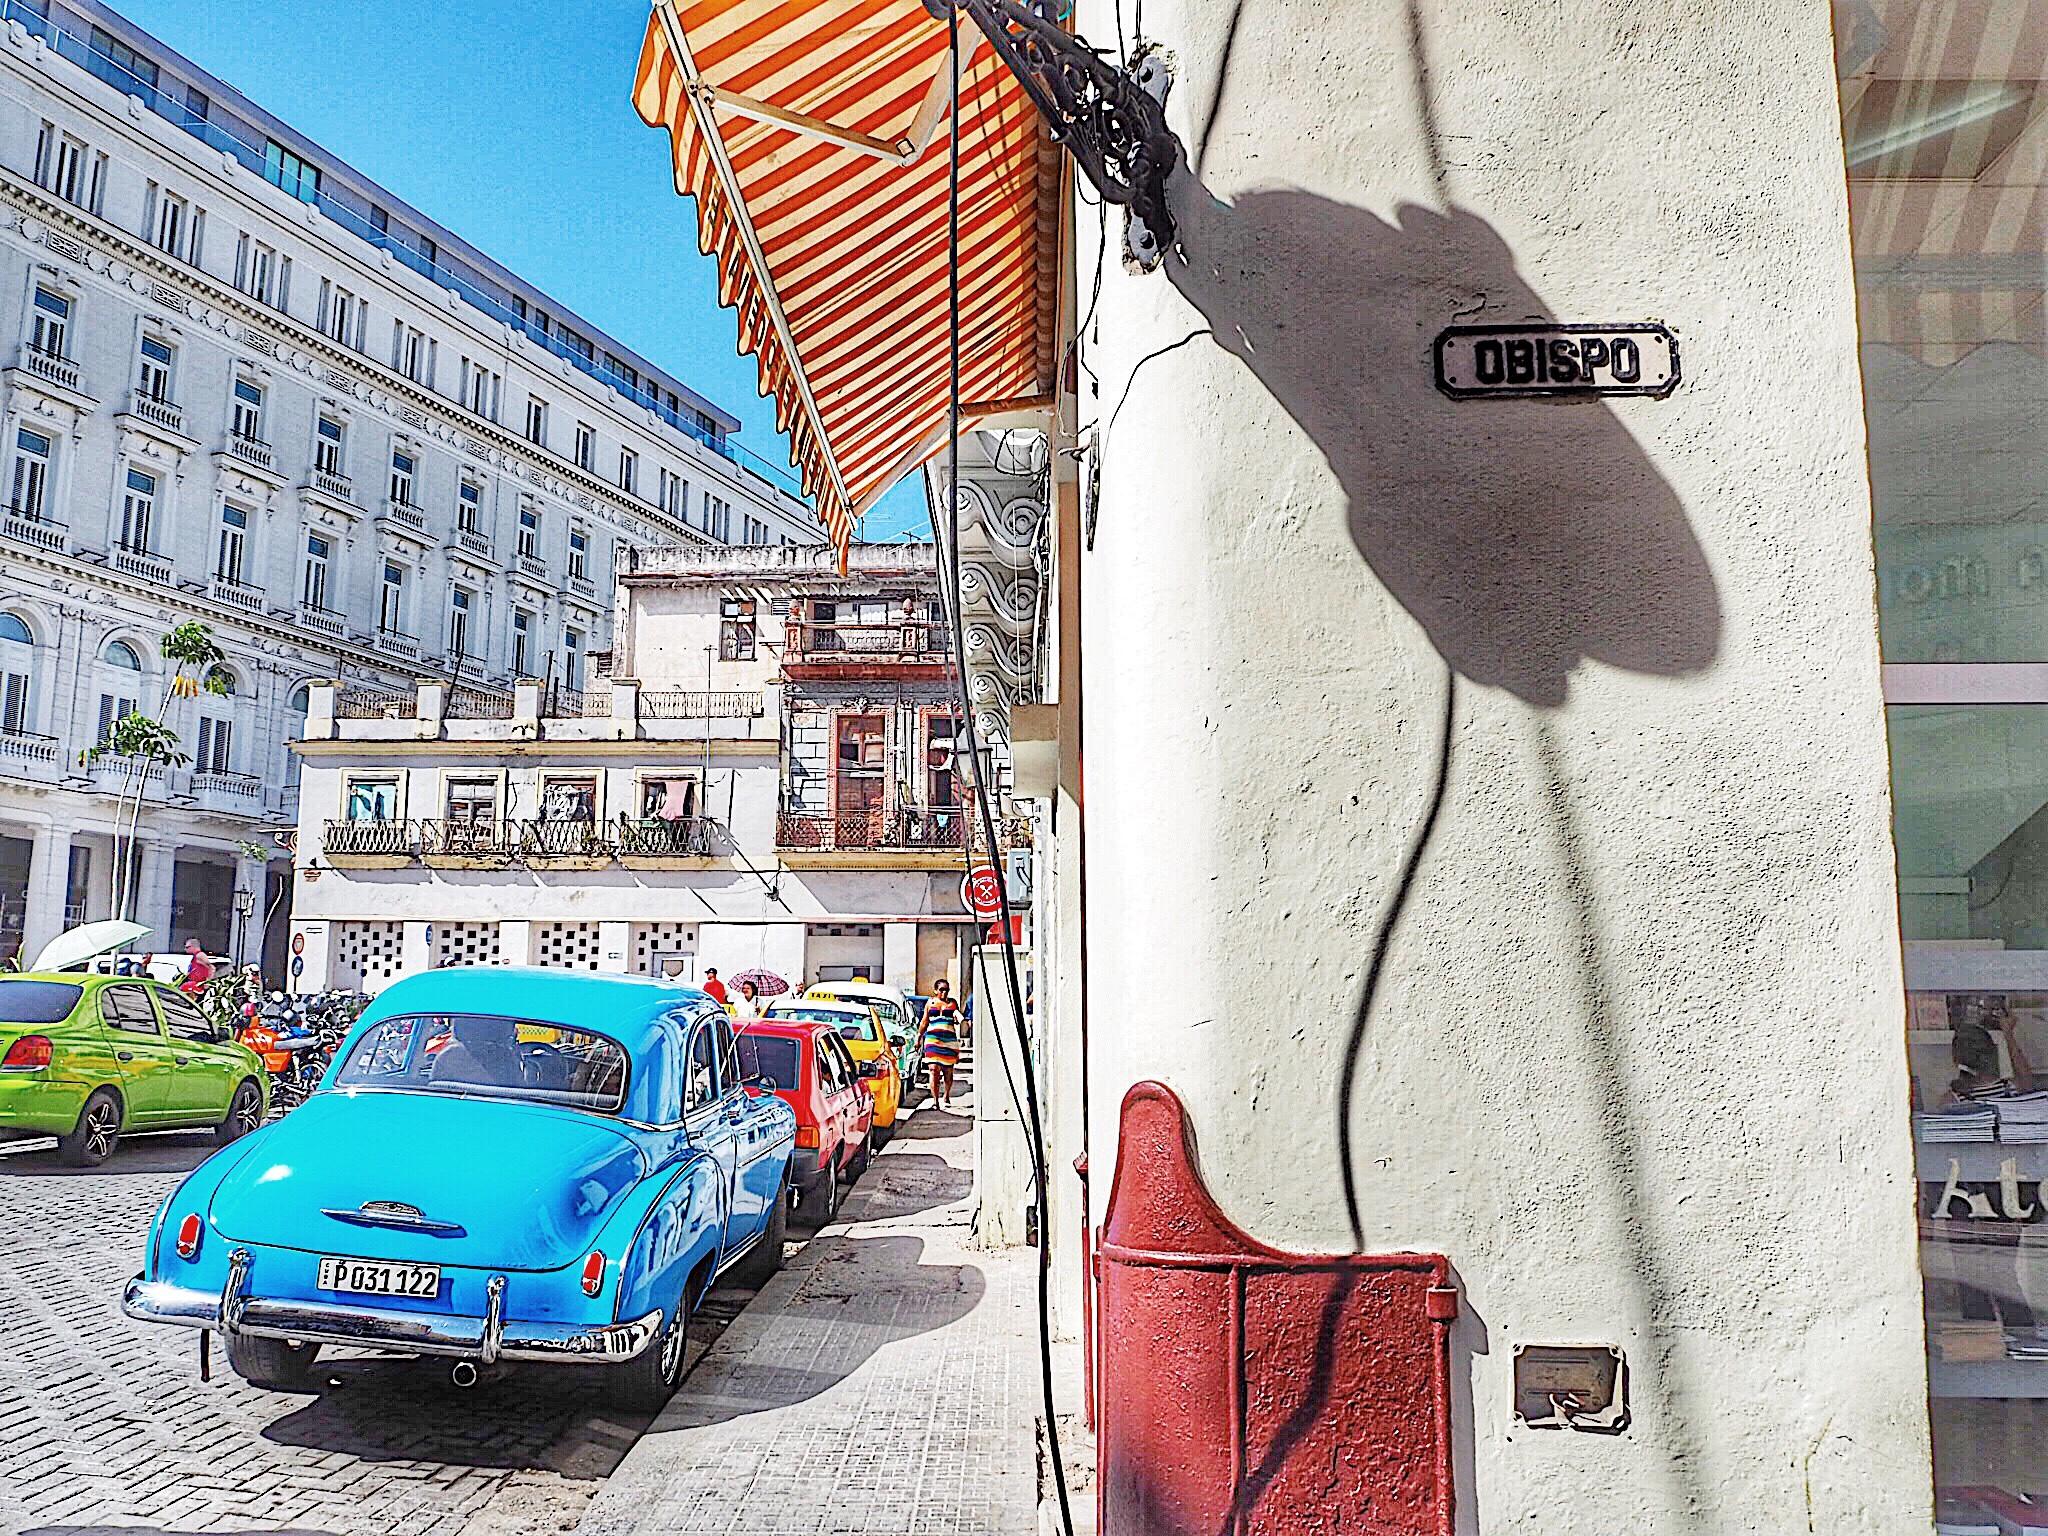 a4db282a 2e6d 4234 89fe 90aac62ffae5 - Old Habana - 街全体が世界遺産 色が溢れるハバナ旧市街散歩で出会った風景